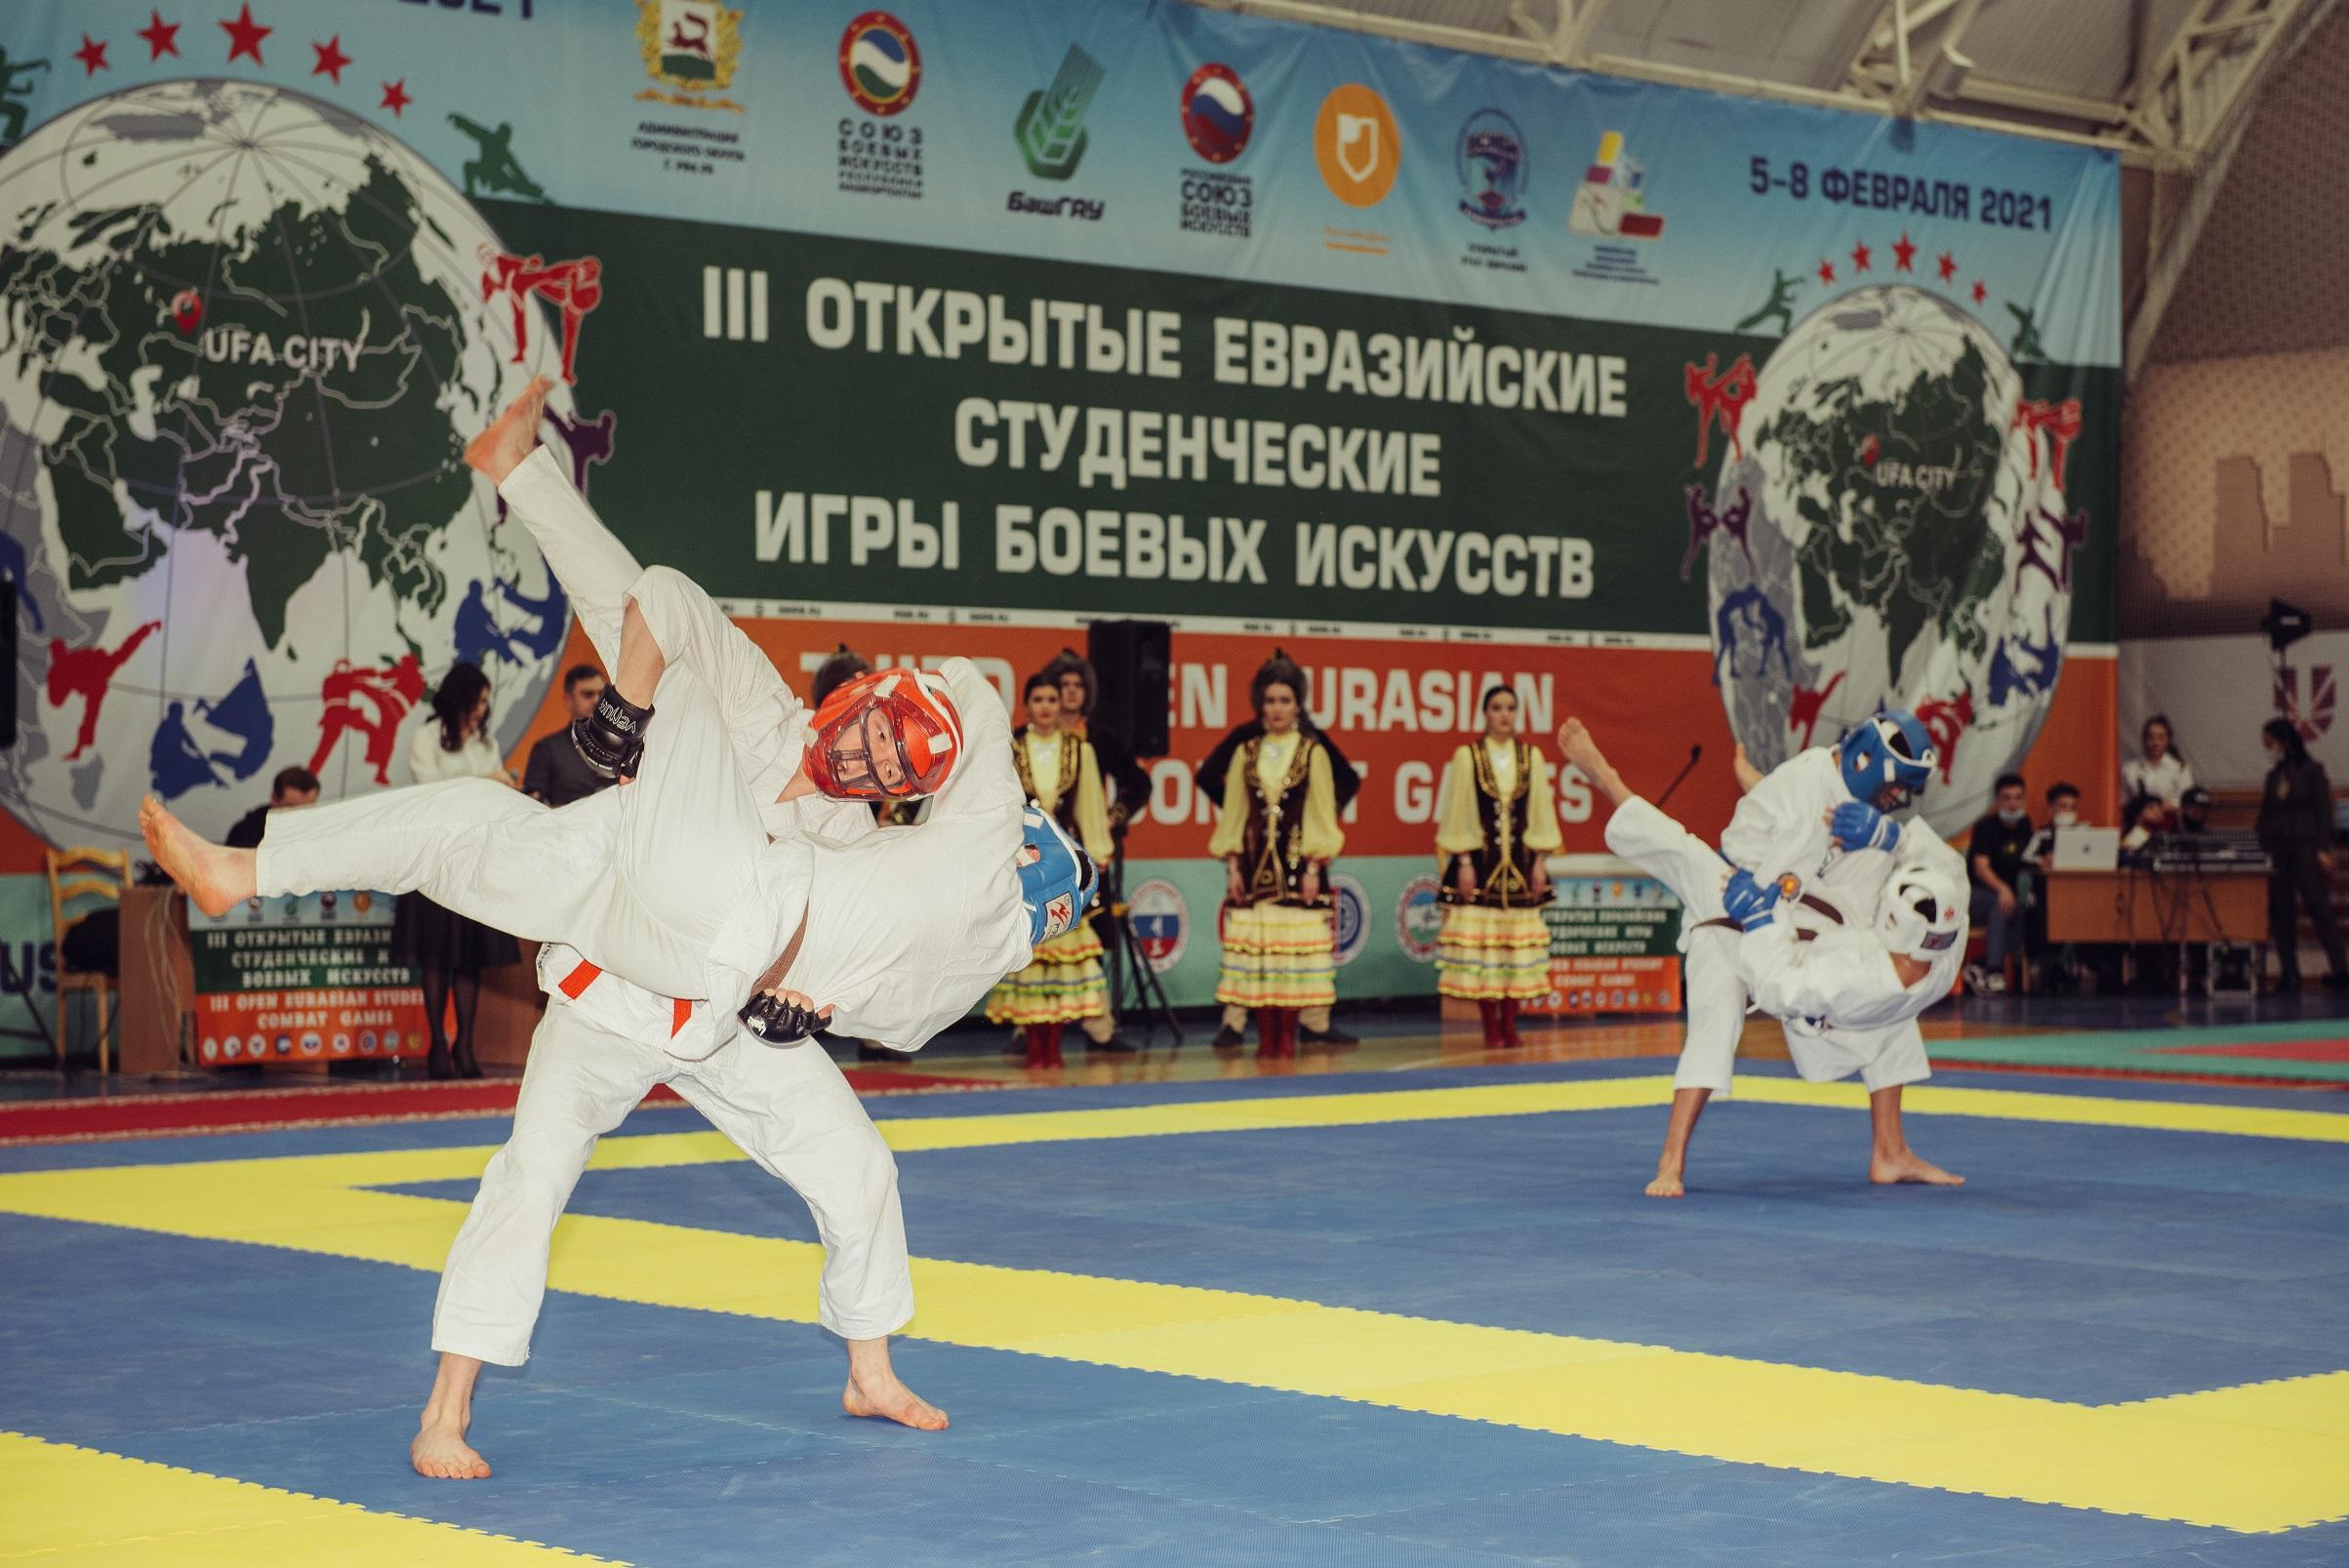 http://sbirb.combatsd.ru/images/upload/3DS_8641.jpg